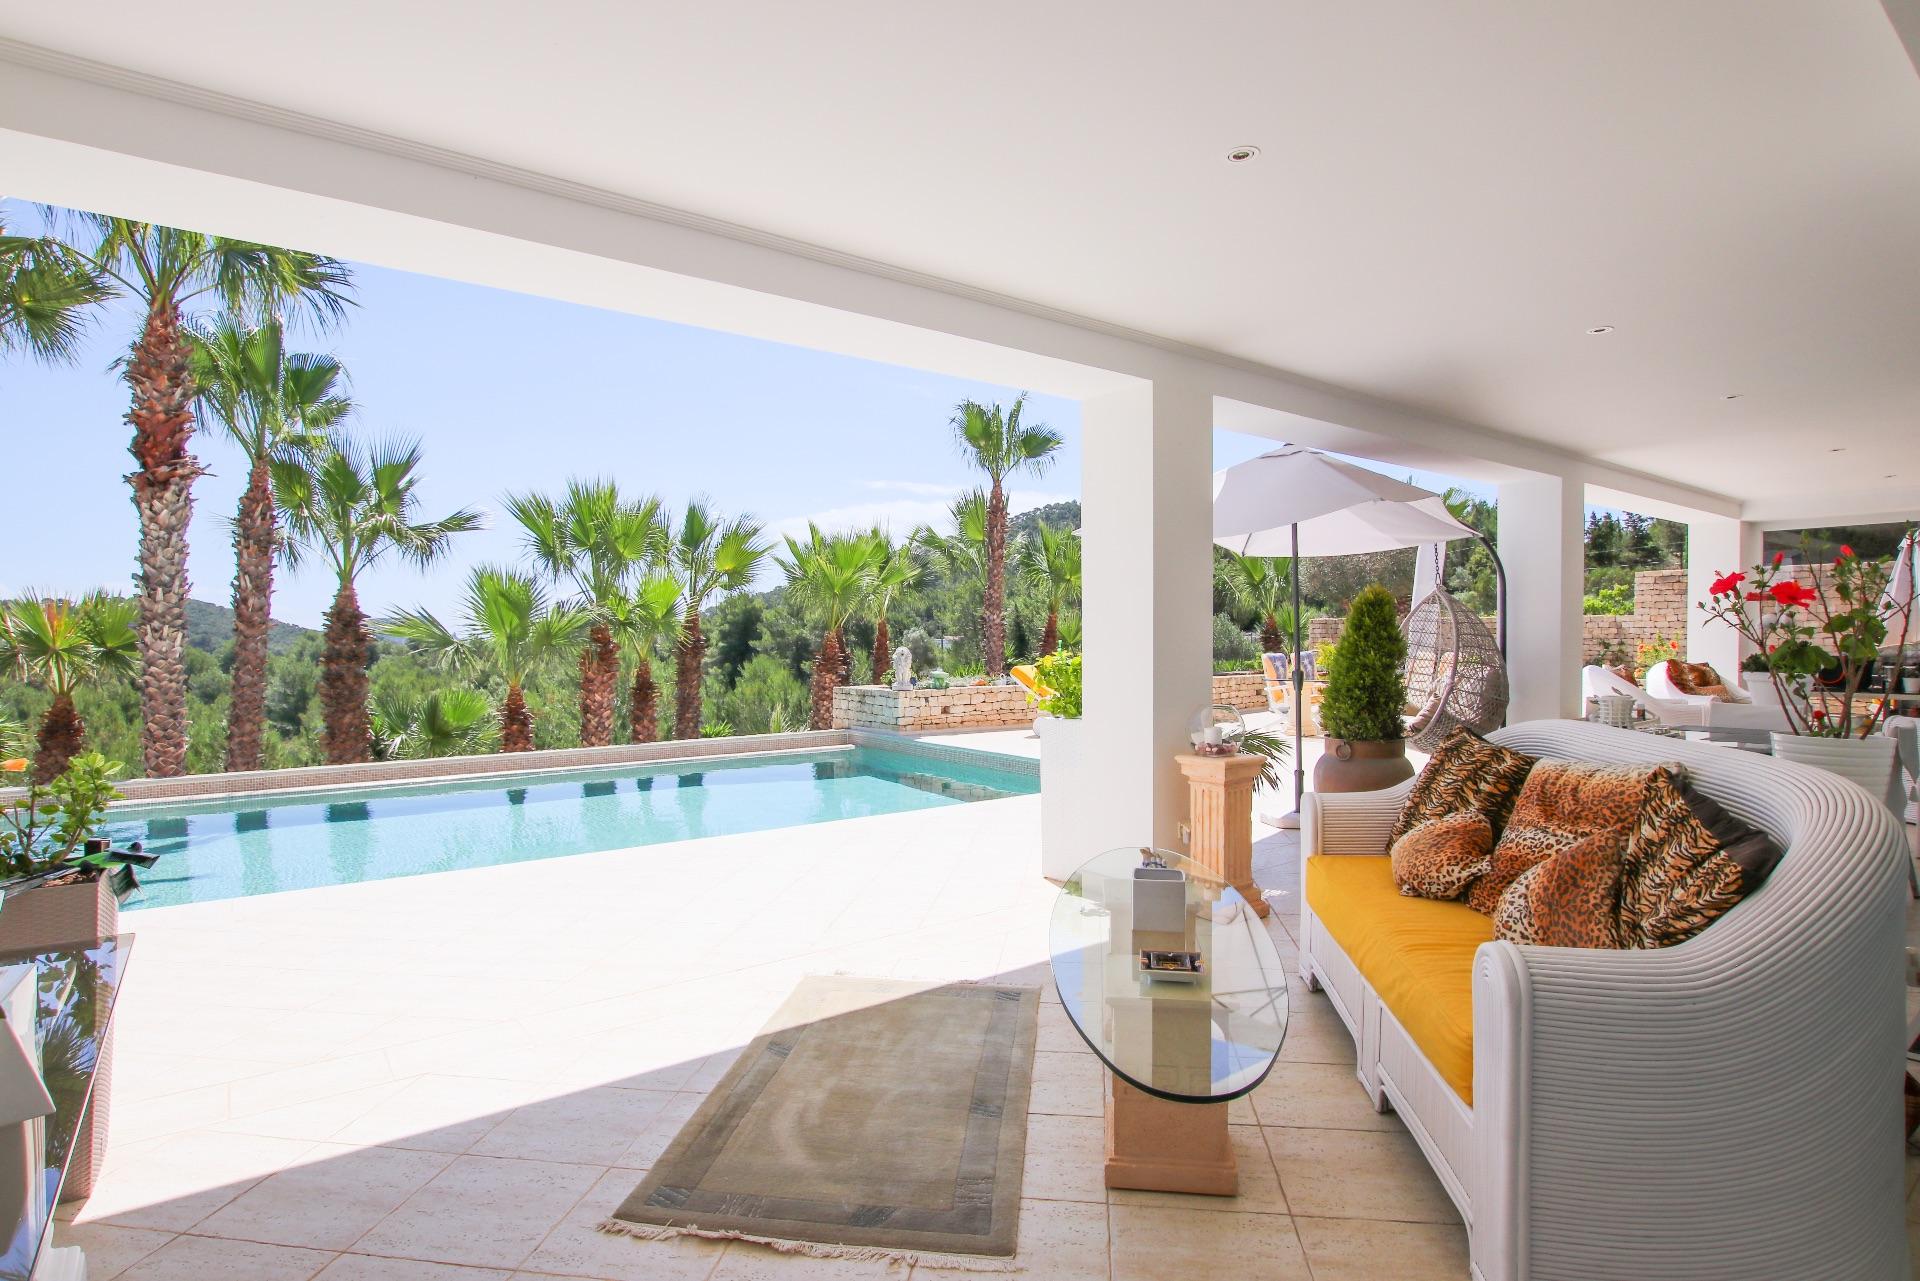 Villa de Lujo en Ibiza, Jesus/Santa Eulalia, venta